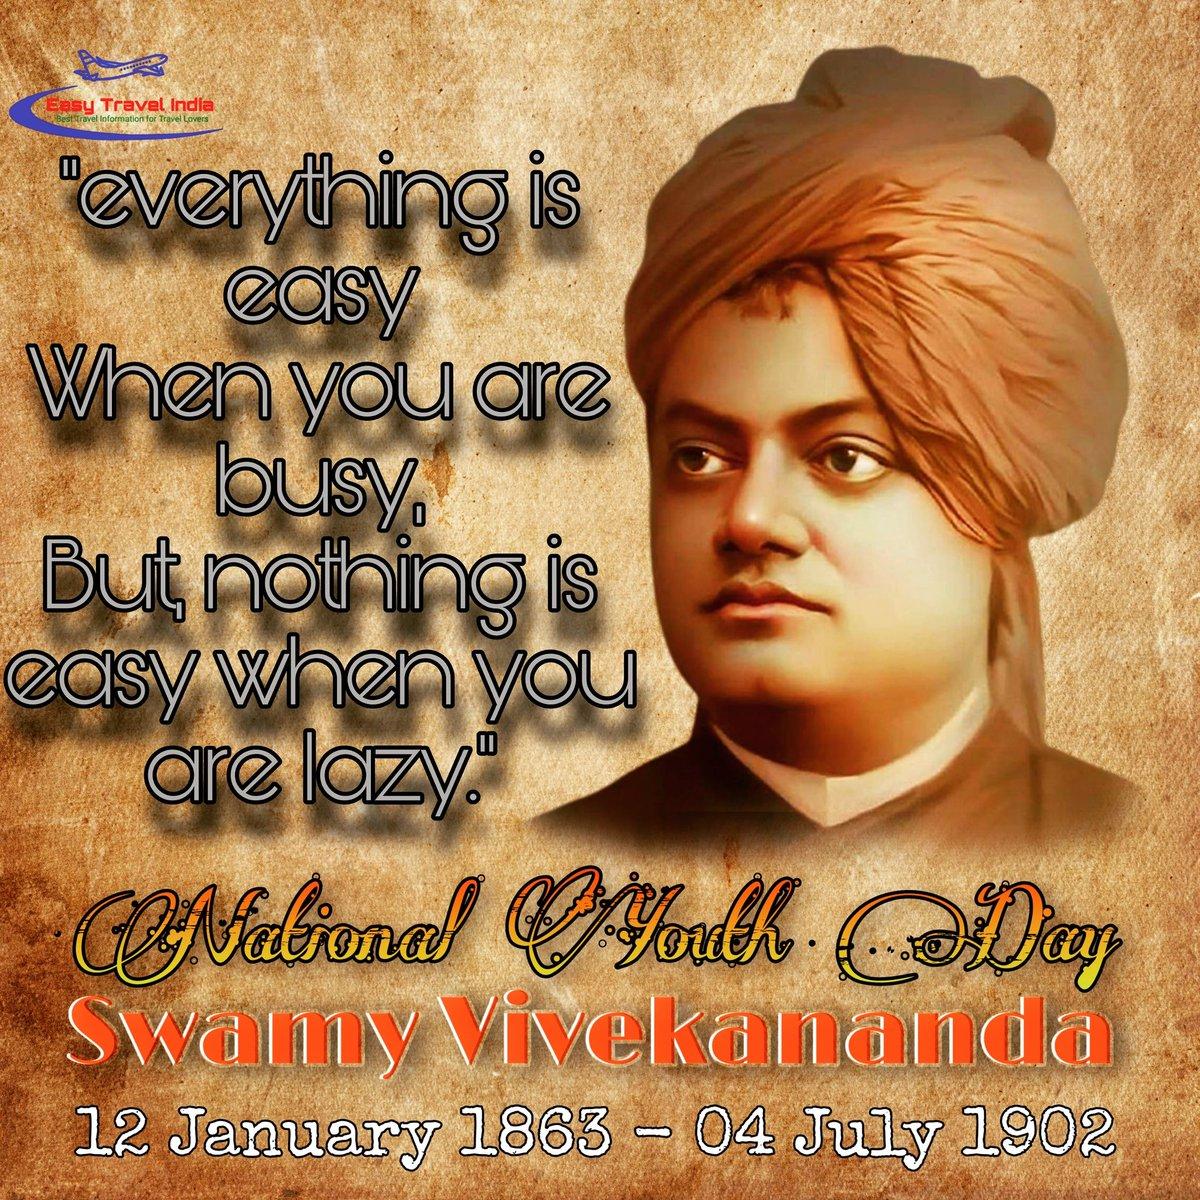 158th Birth Anniversary of #SwamiVivekananda #SwamyVivekanandaJayanthi #NationalYouthDay #NationalYouthDay2021 #ramakrishnaparamahamsa #RamaKrishnaMission #parliamentofworldsreligion #Chicago #Kolkata #WestBengal #India